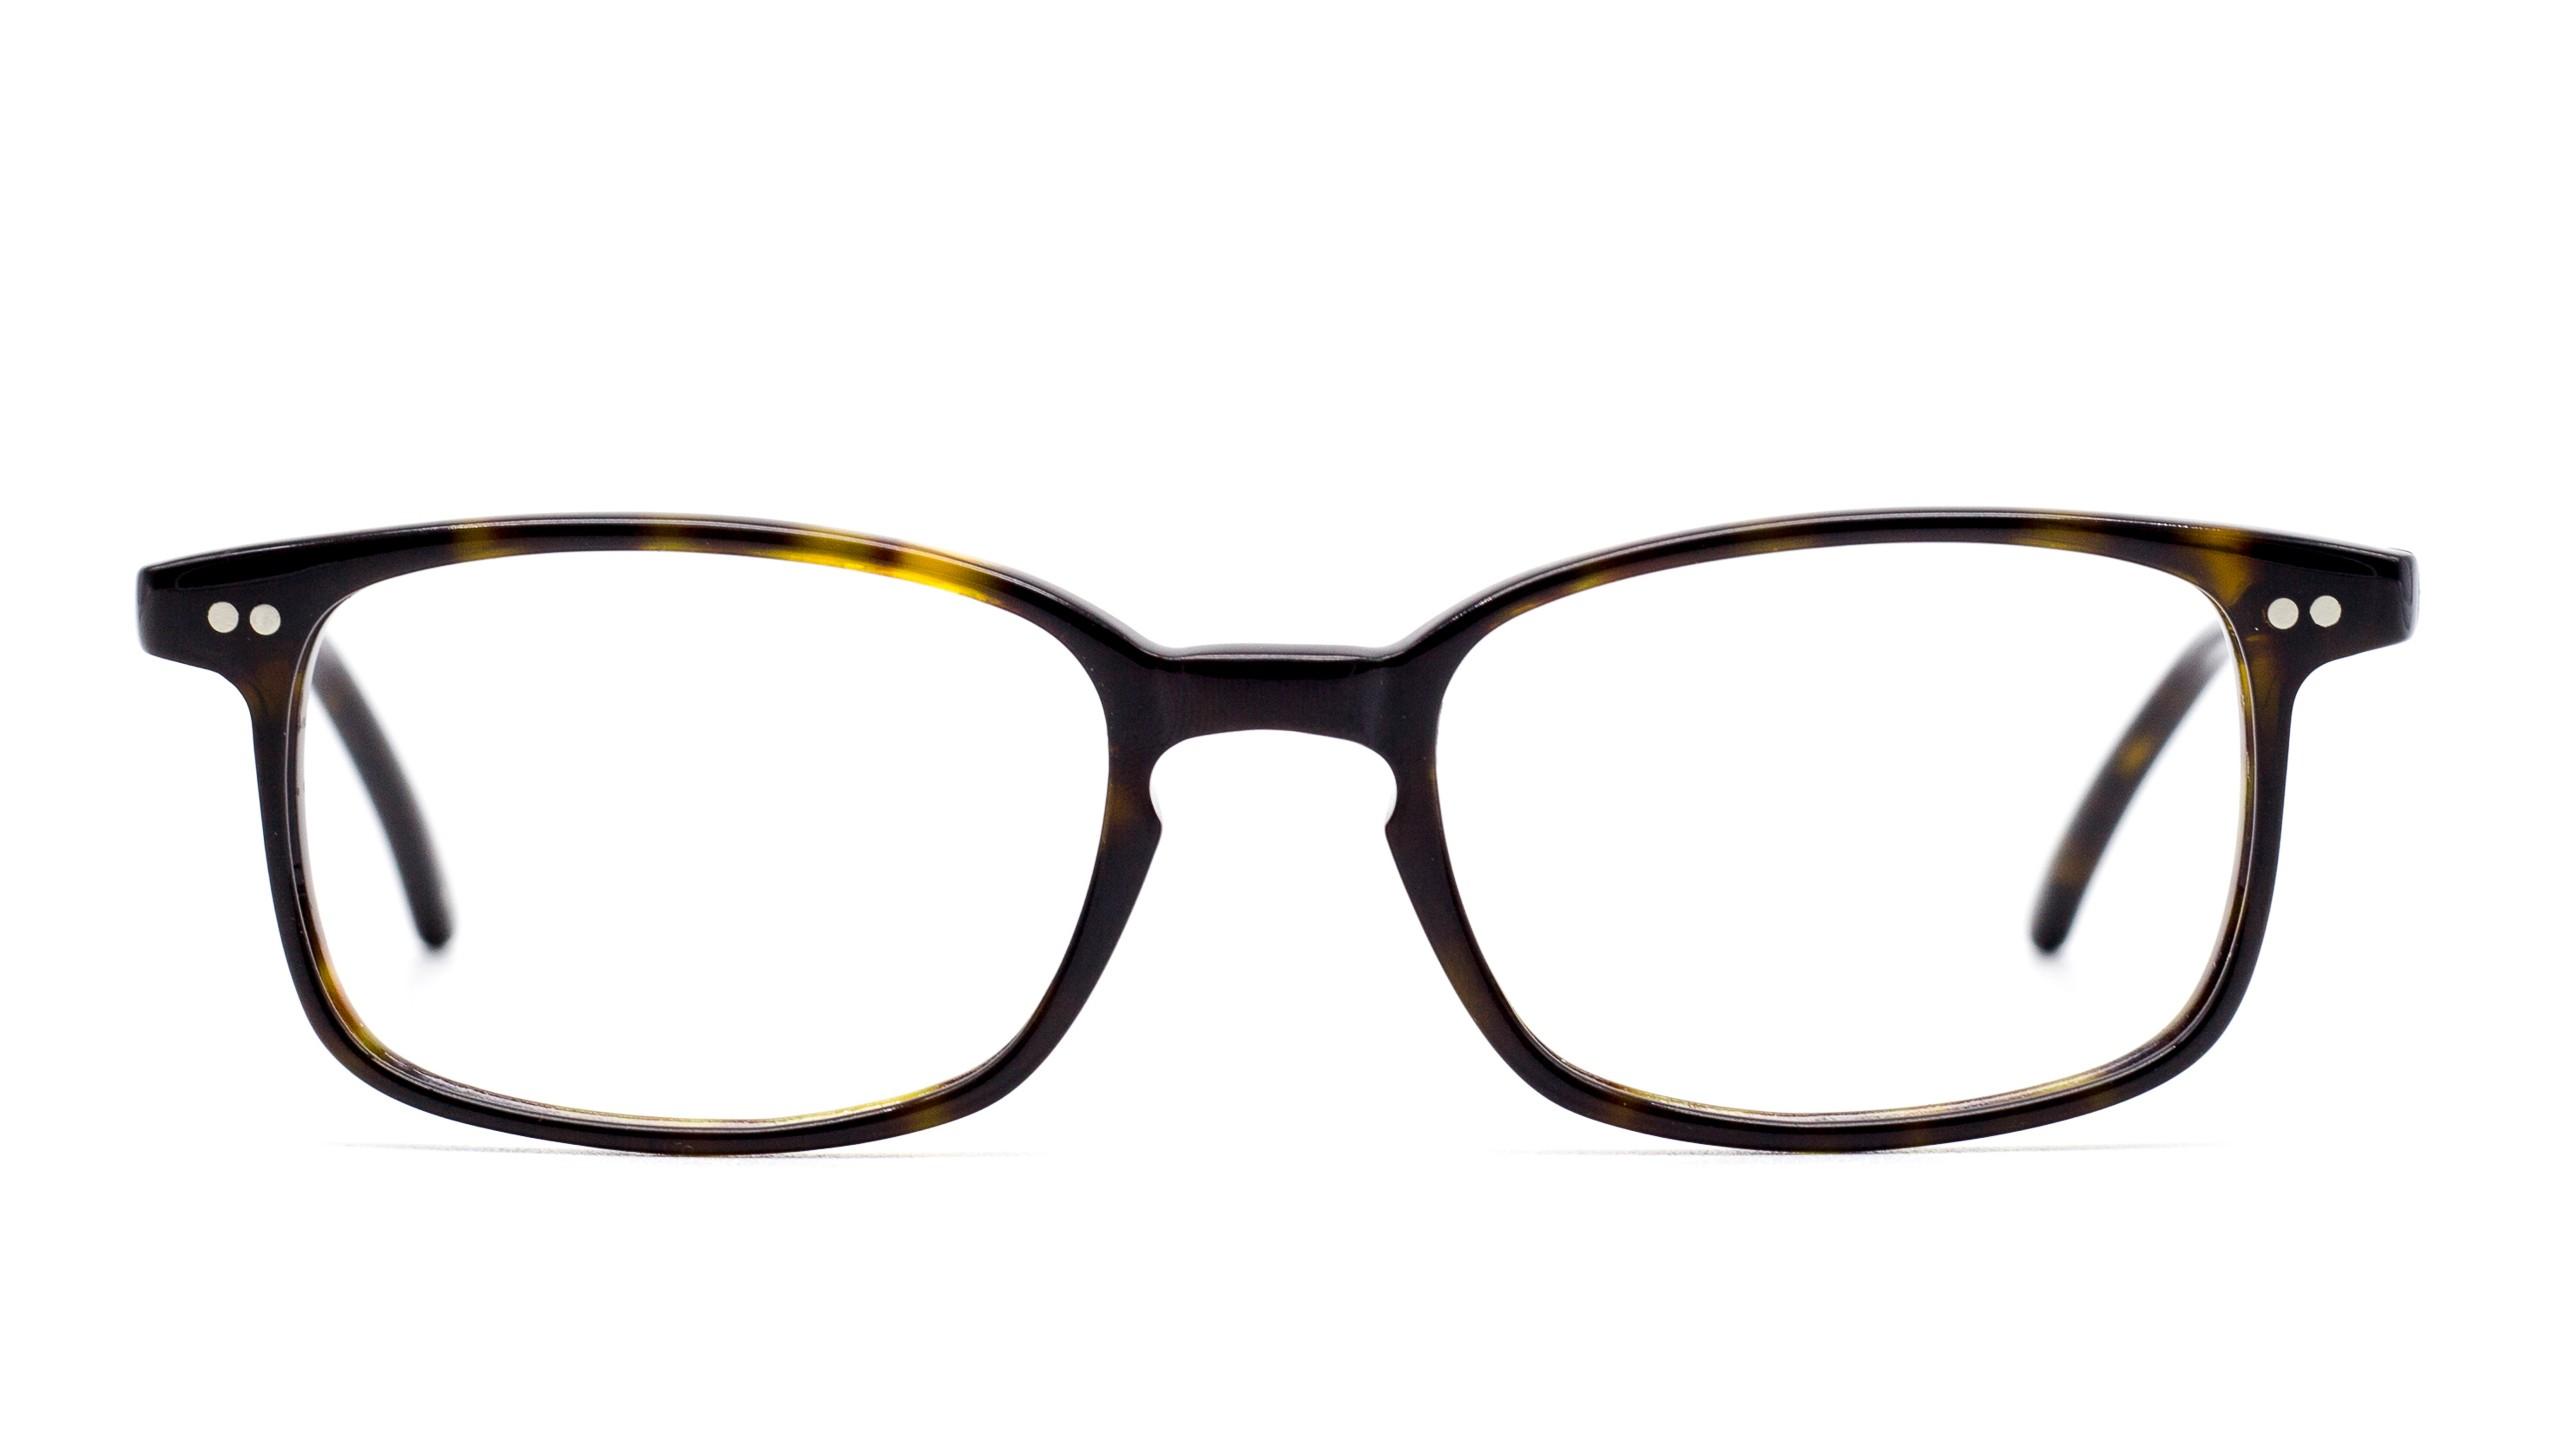 eyeglasses-Nathan-Kaltermann-made-in-Italy-Eddy-C02-Vista1